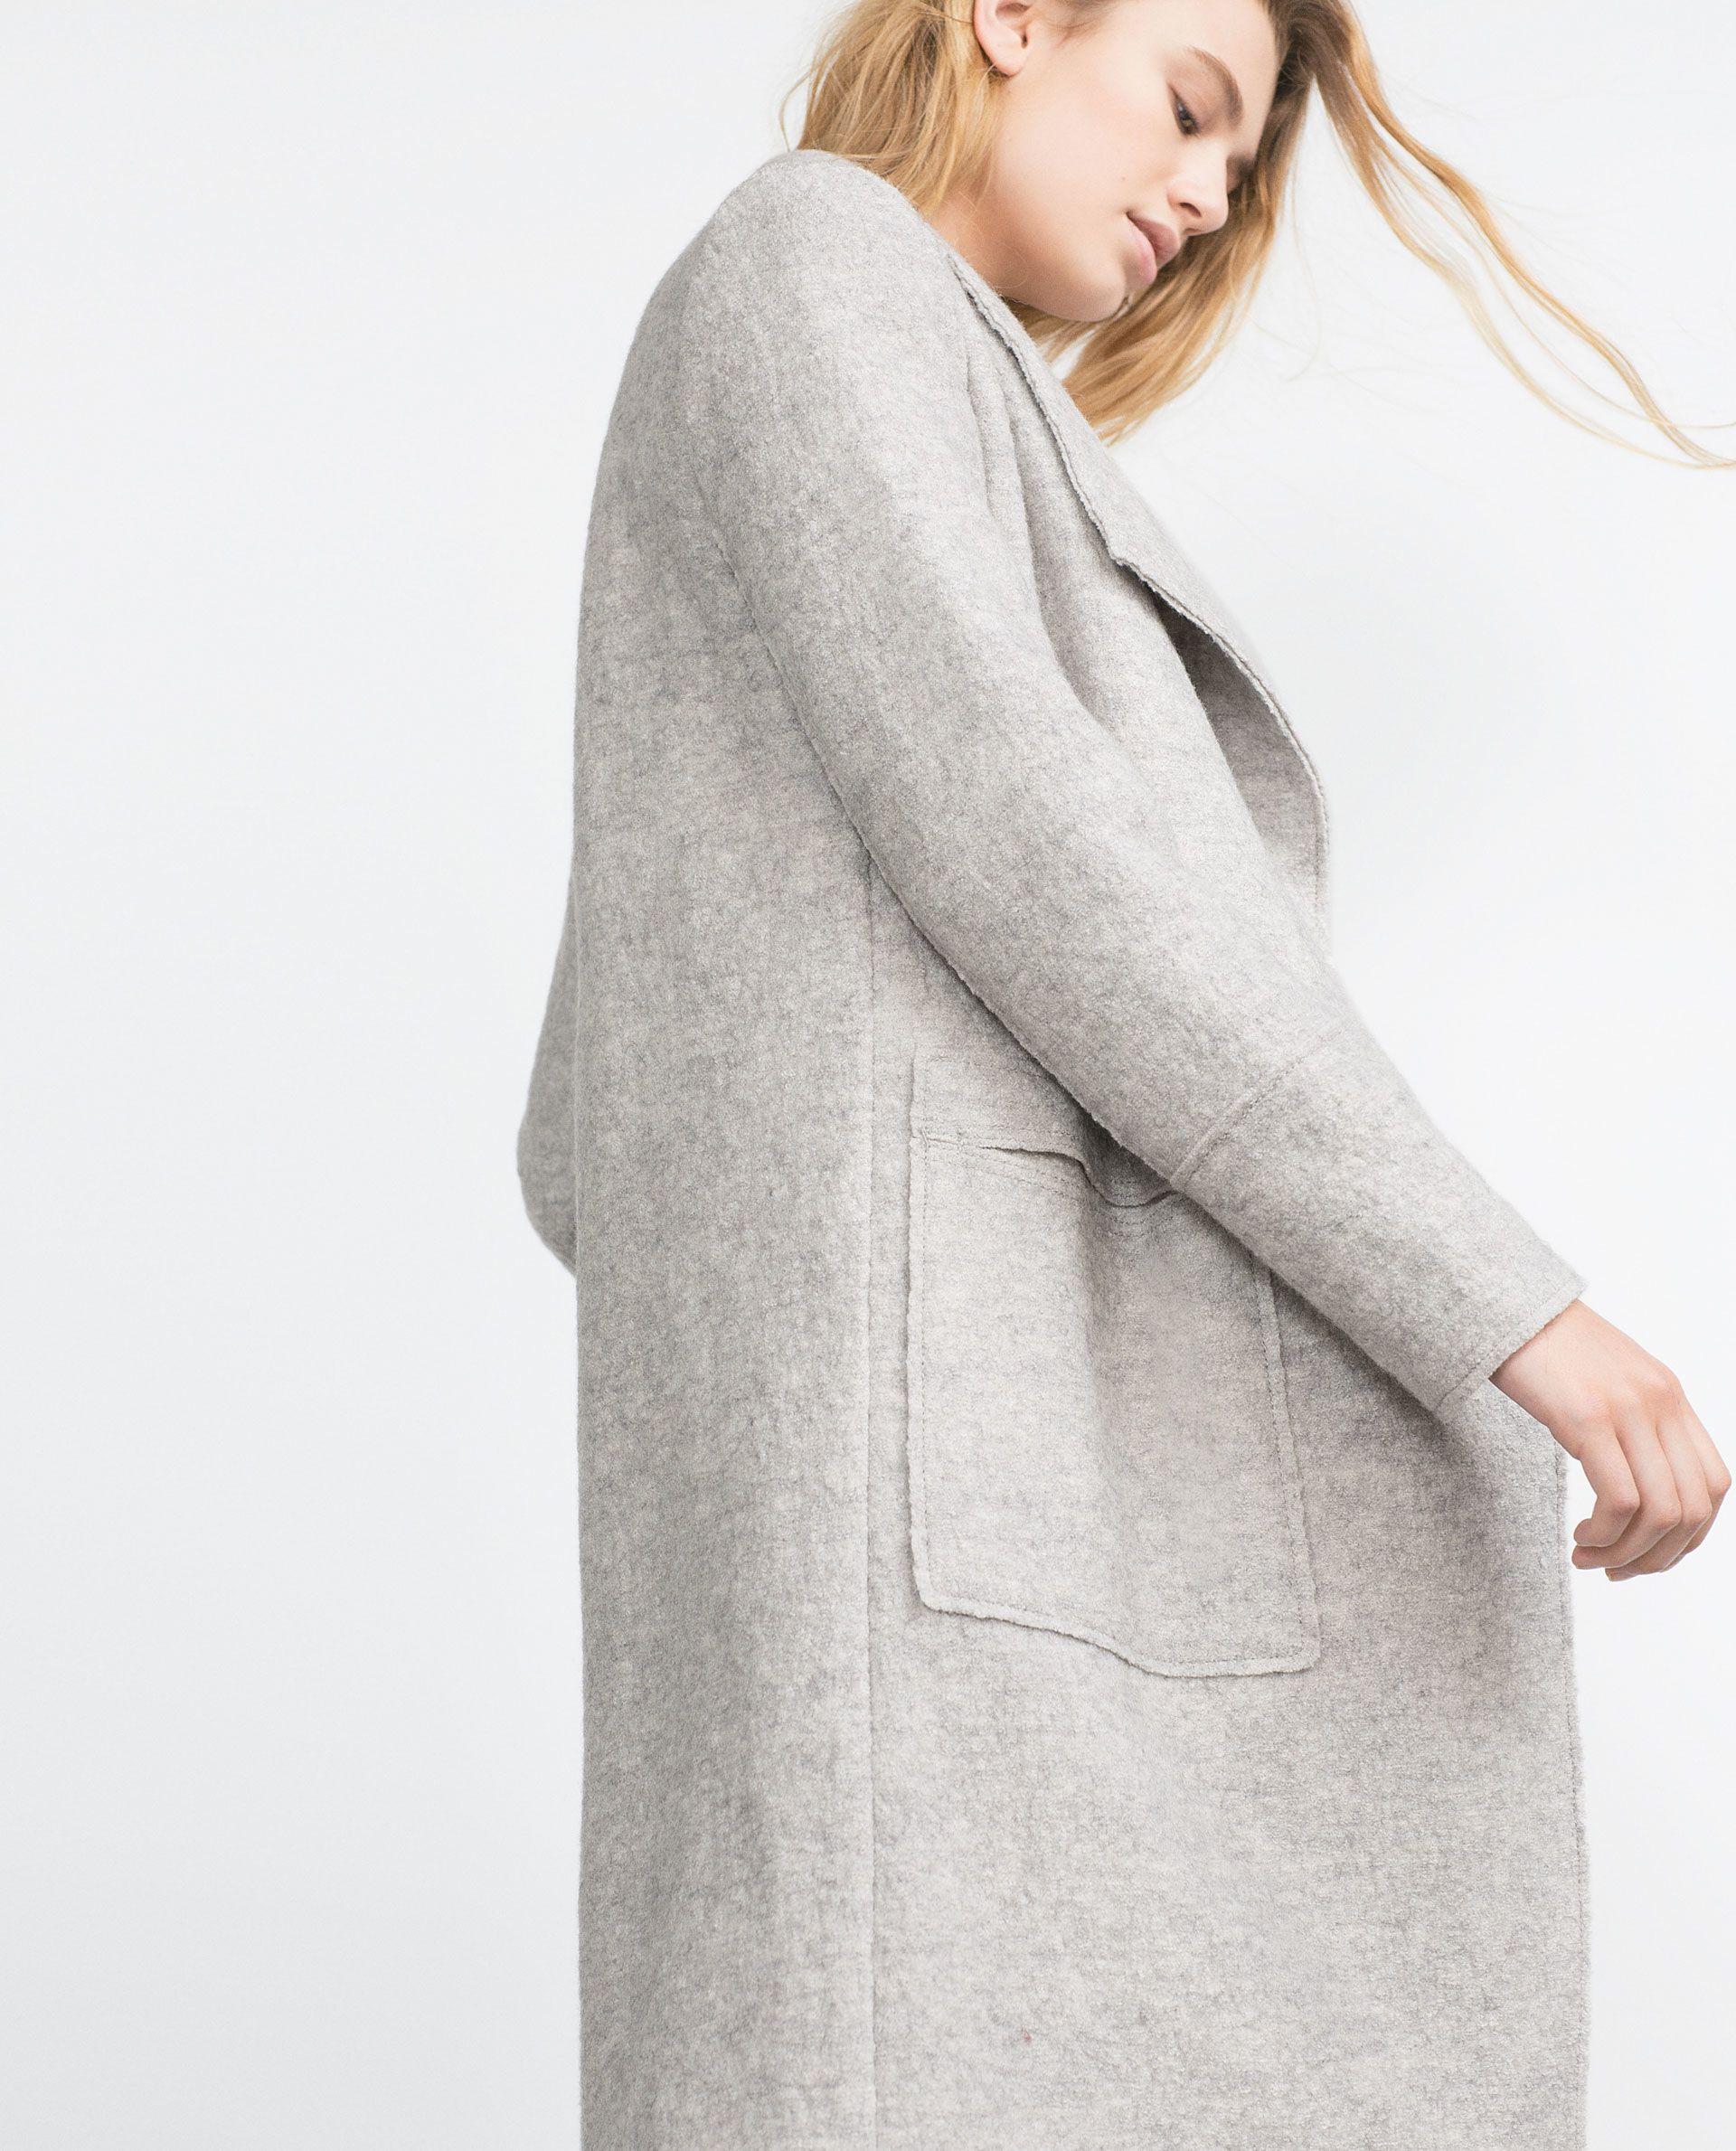 zara-light-grey-wool-coat-wool-coat-gray-product-5-866025978 ...